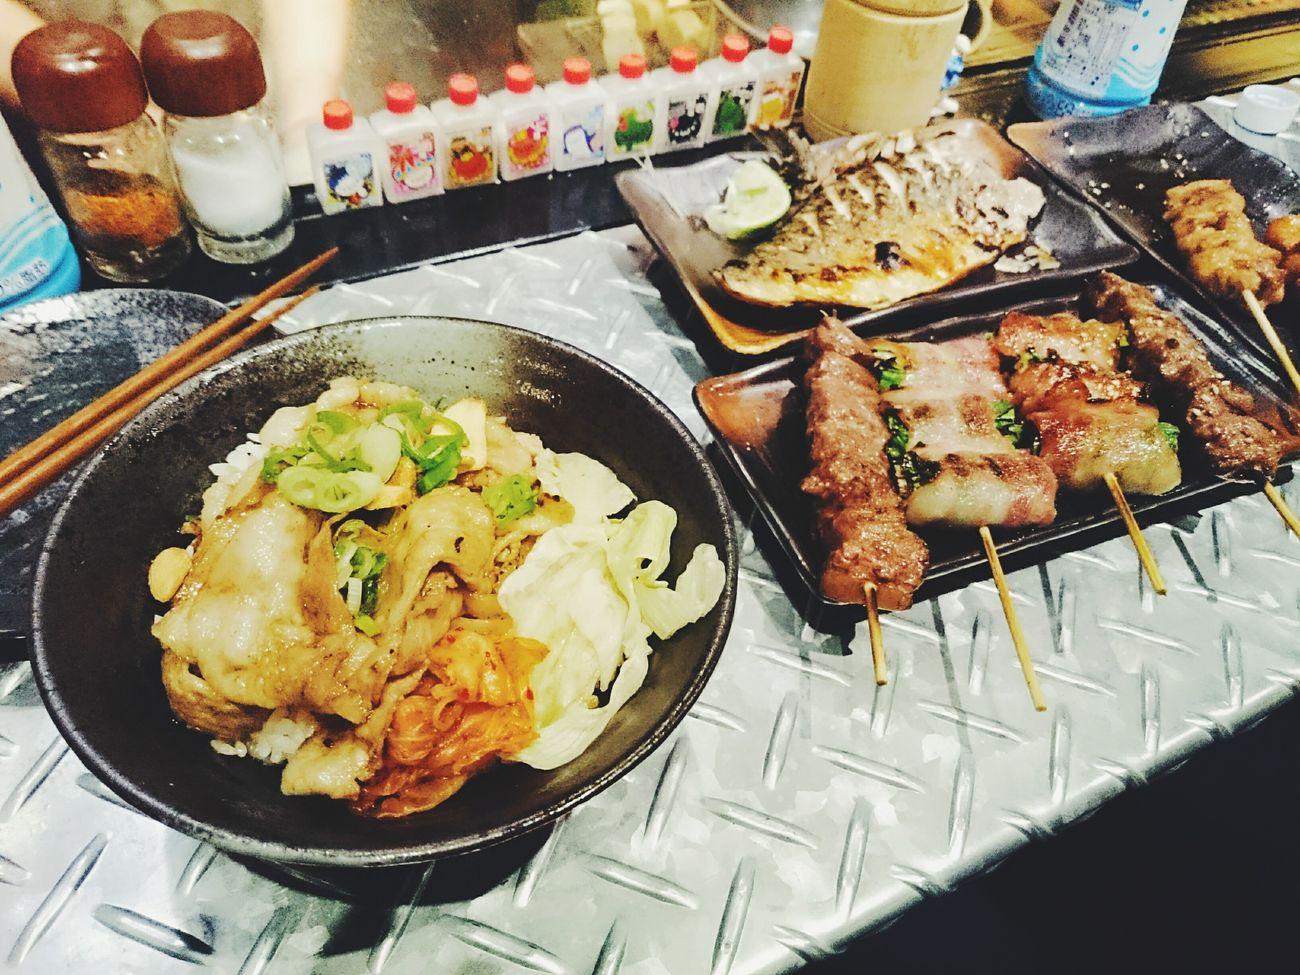 呷奔🍴✨✨。 Dinner Japanese Food 串燒 丼飯 Taipei